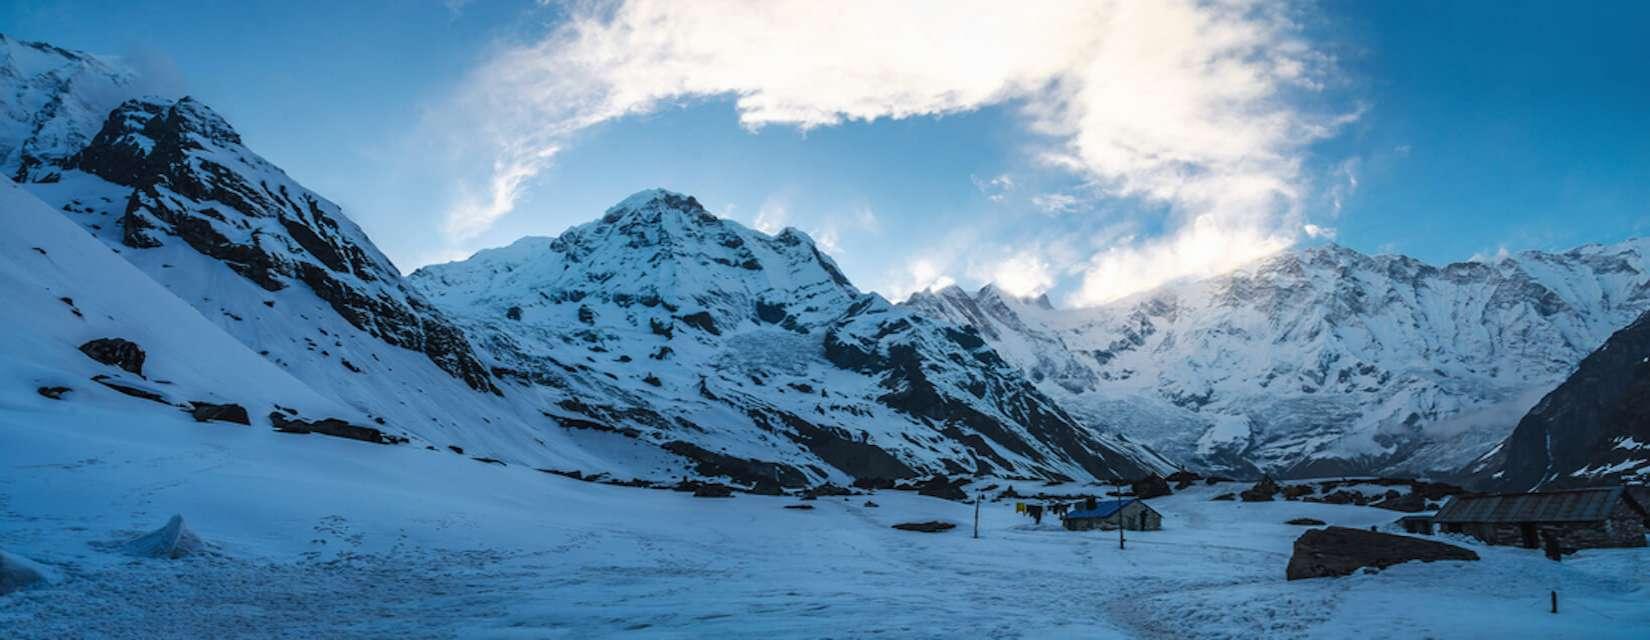 Annapurna Base Camp for a solo traveler